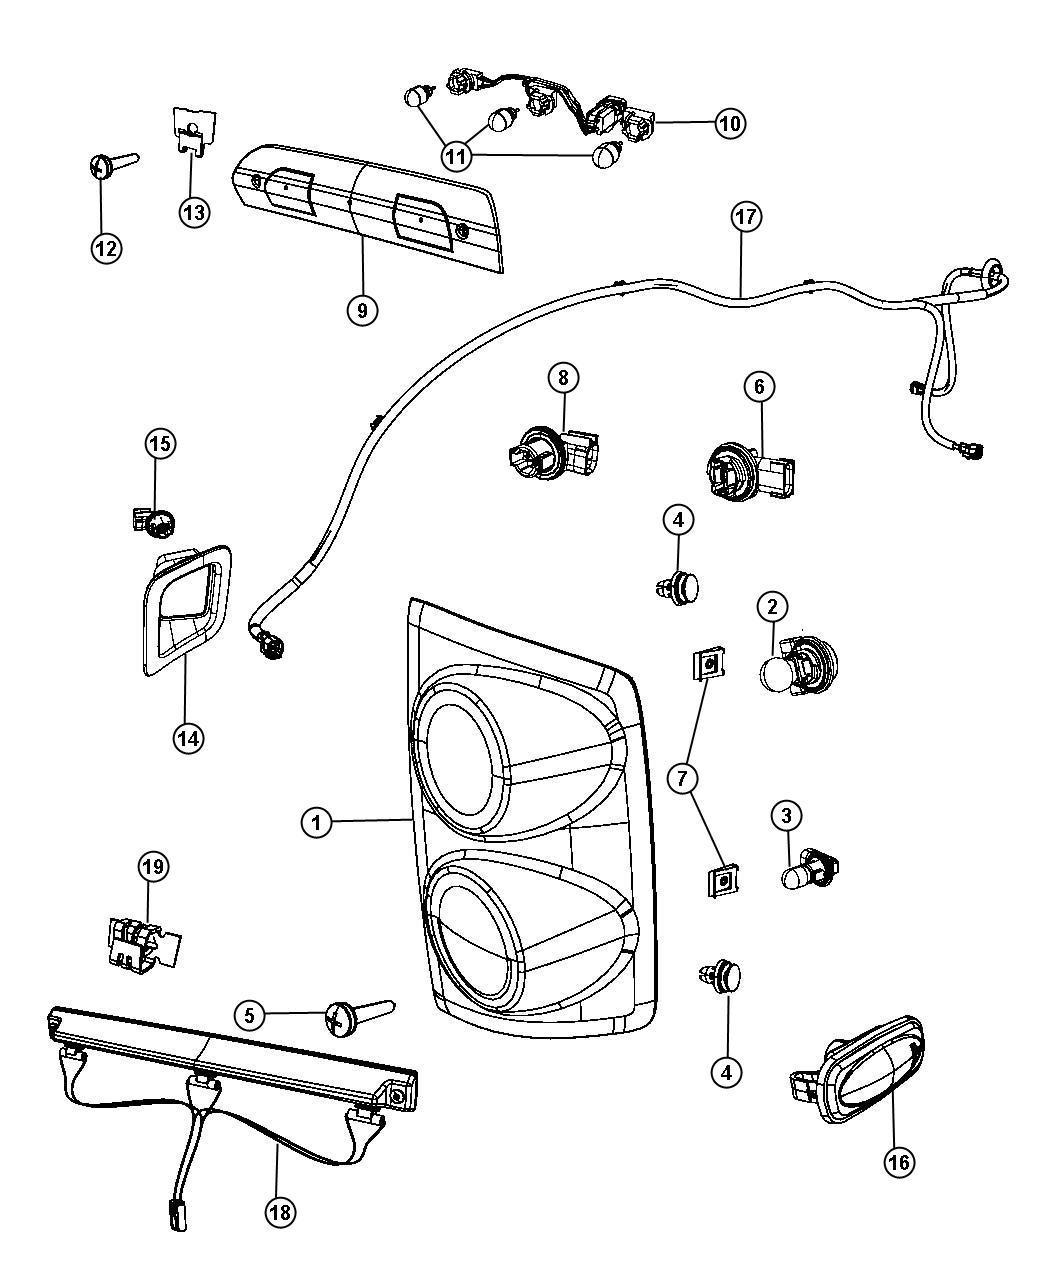 Dodge Ram 3500 Wiring. Fender lamp. [dual rear wheels